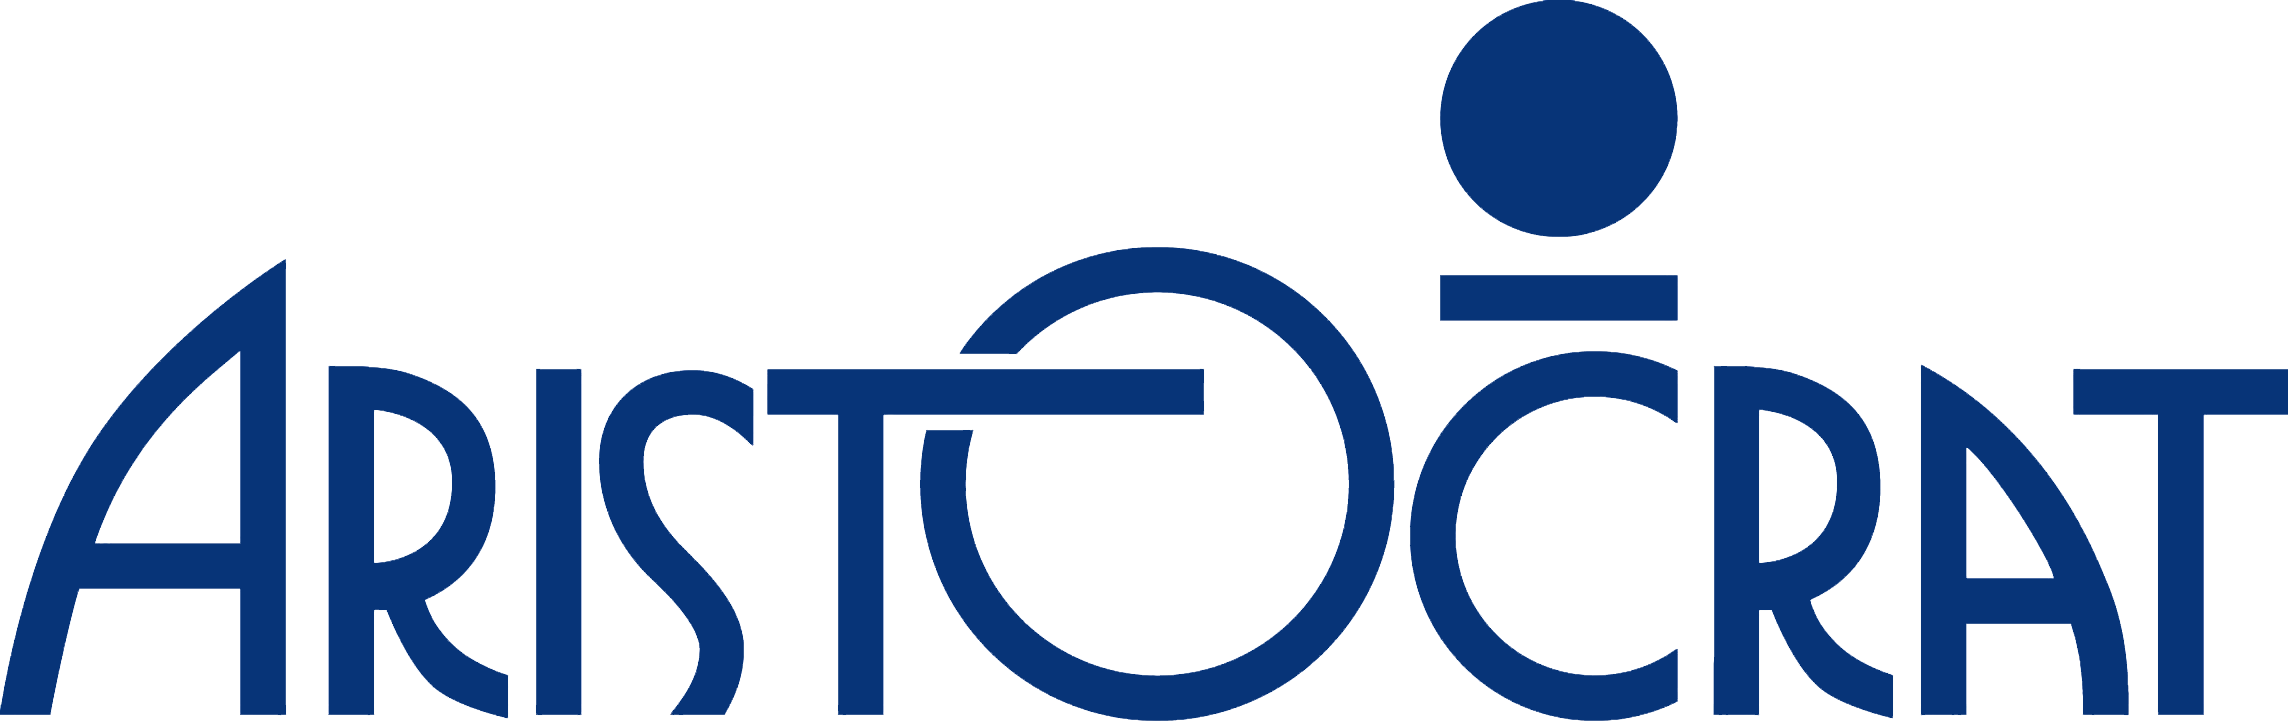 Aristocrat Leisure Ltd. (ASX:ALL) Company Logo